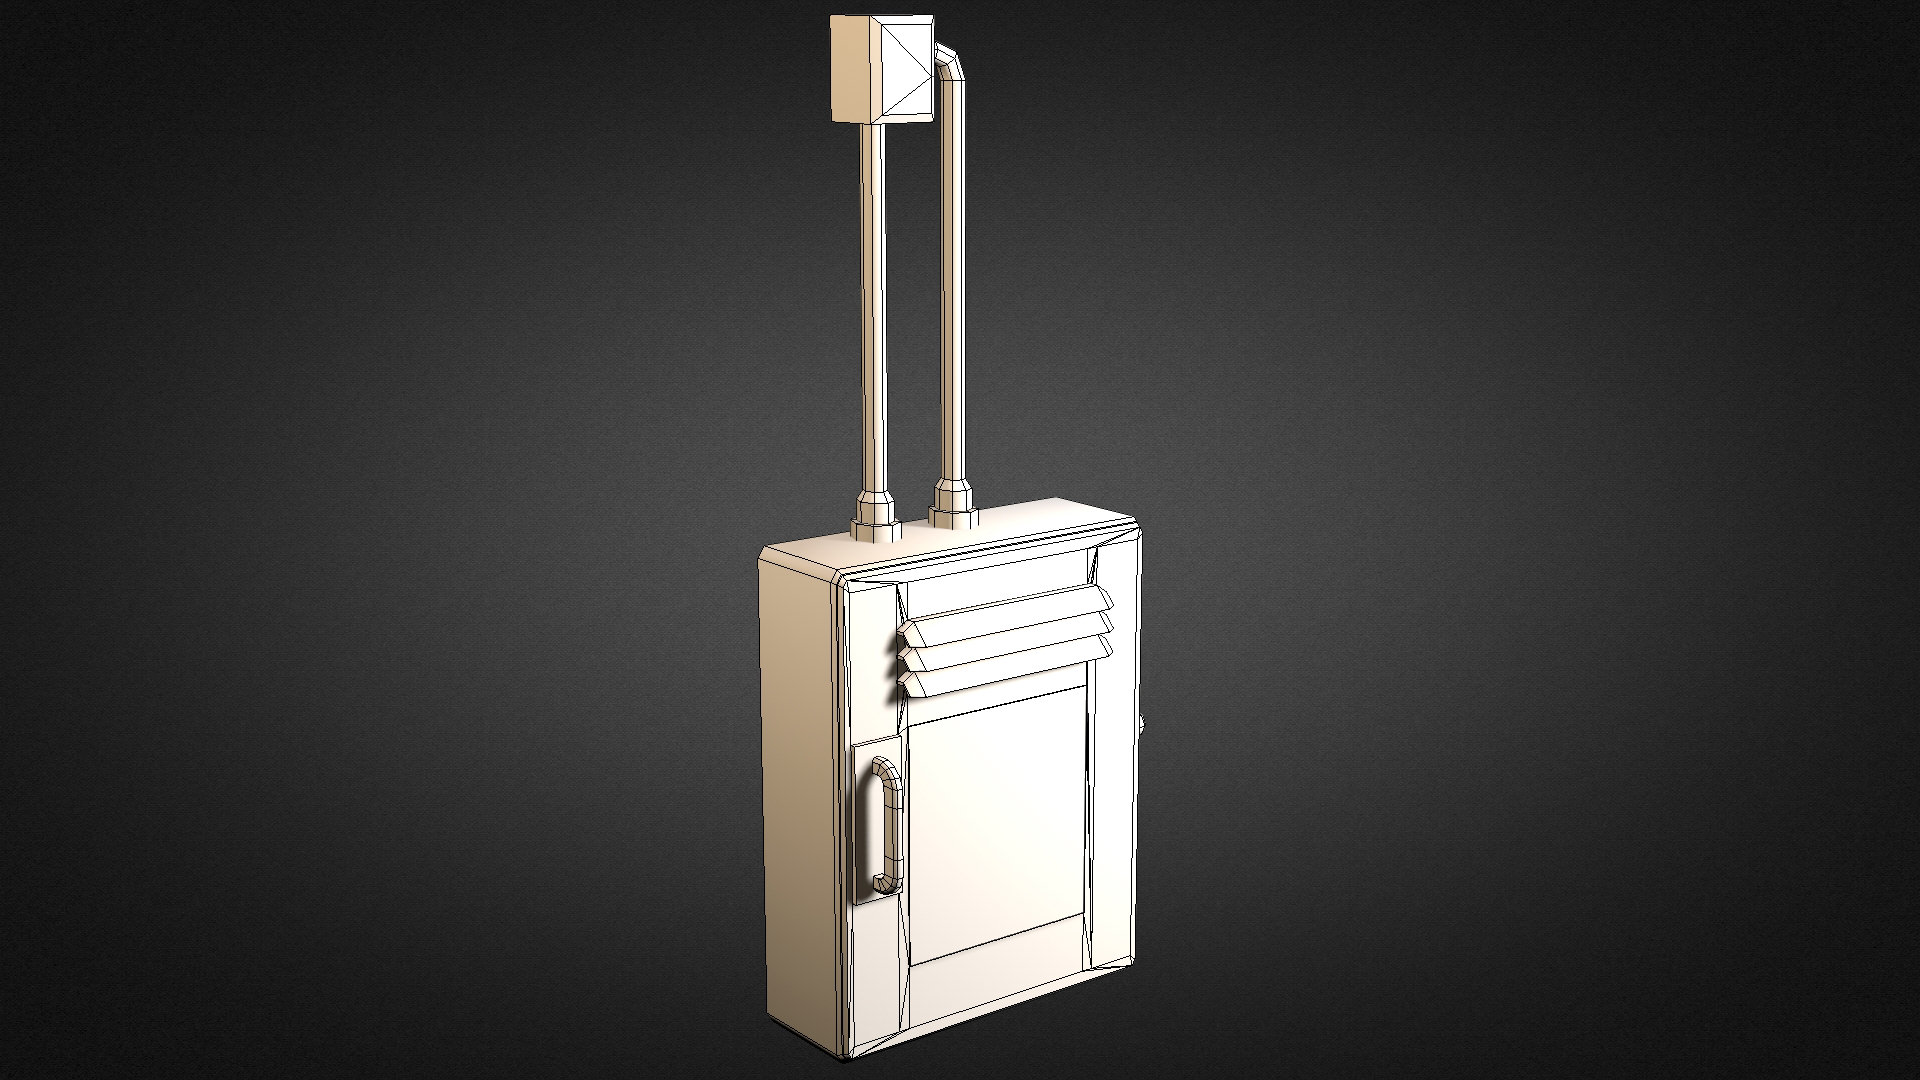 electric fuse box 01 3d model game ready max obj 3ds. Black Bedroom Furniture Sets. Home Design Ideas